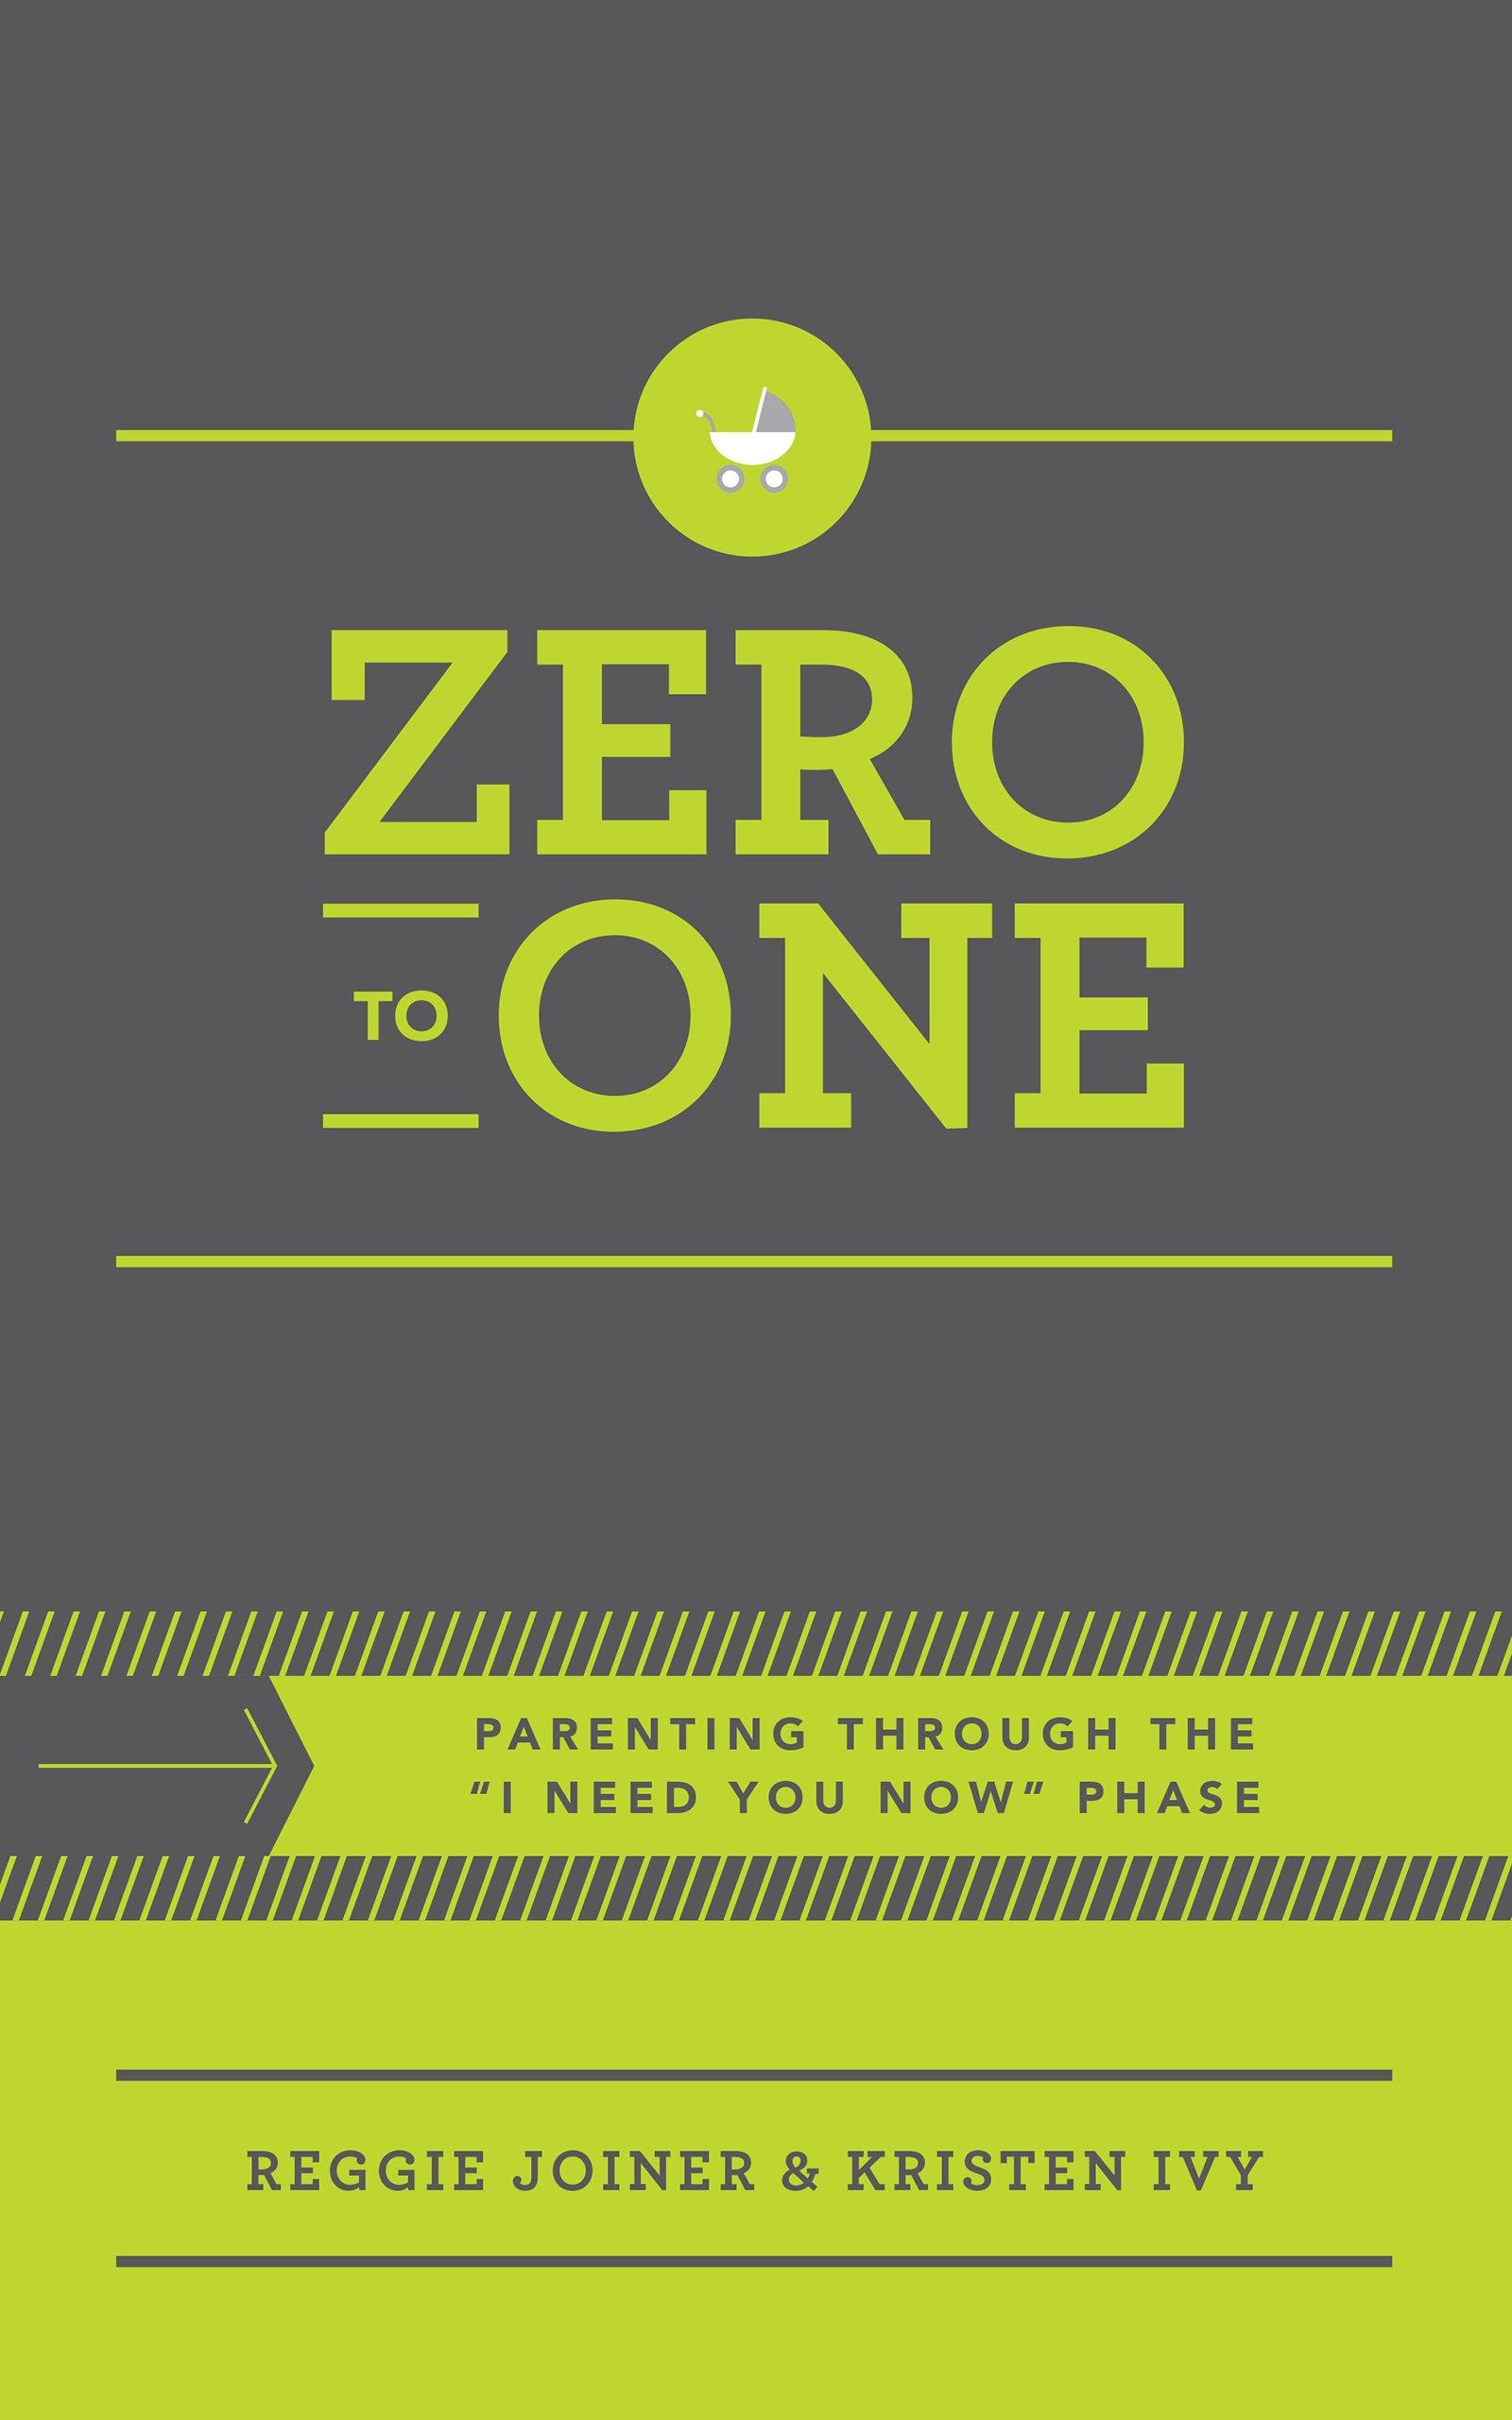 Zero One Parenting Through Phase product image